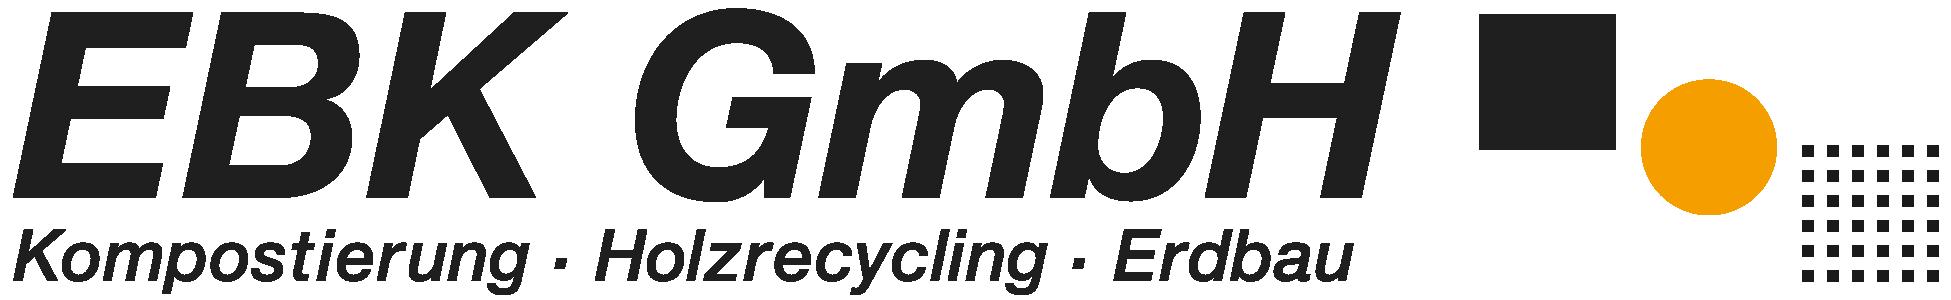 Berliner Kompostierungsgesellschaft